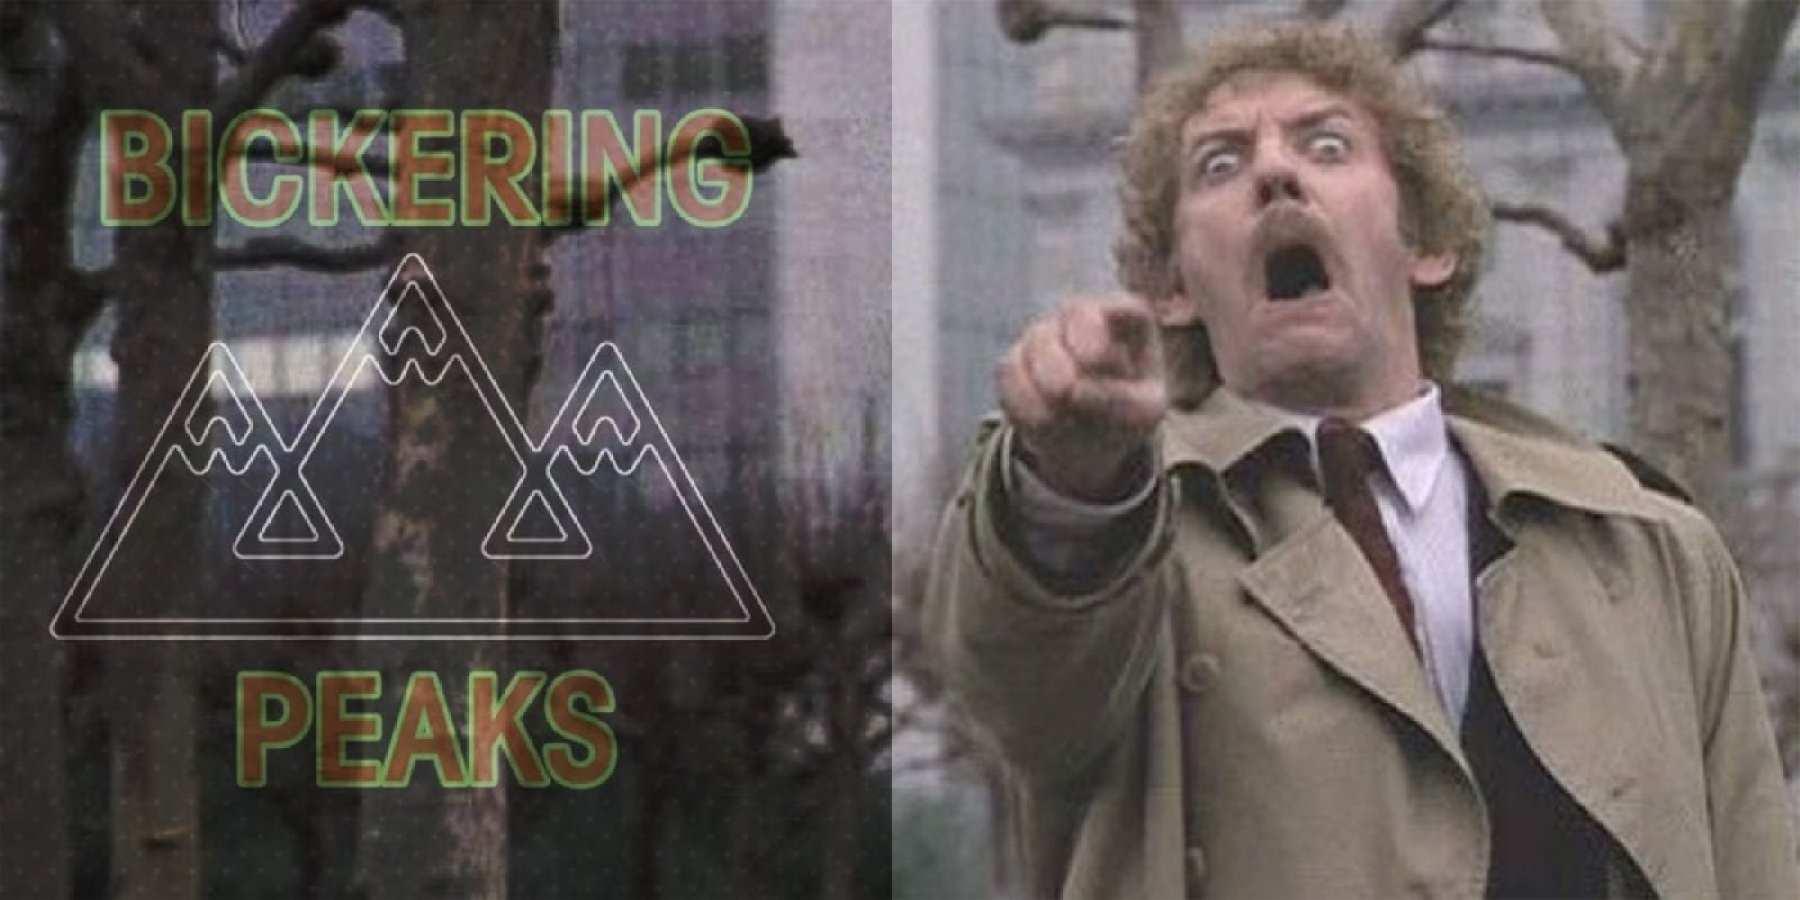 Bickering Peaks and Donald Sutherland